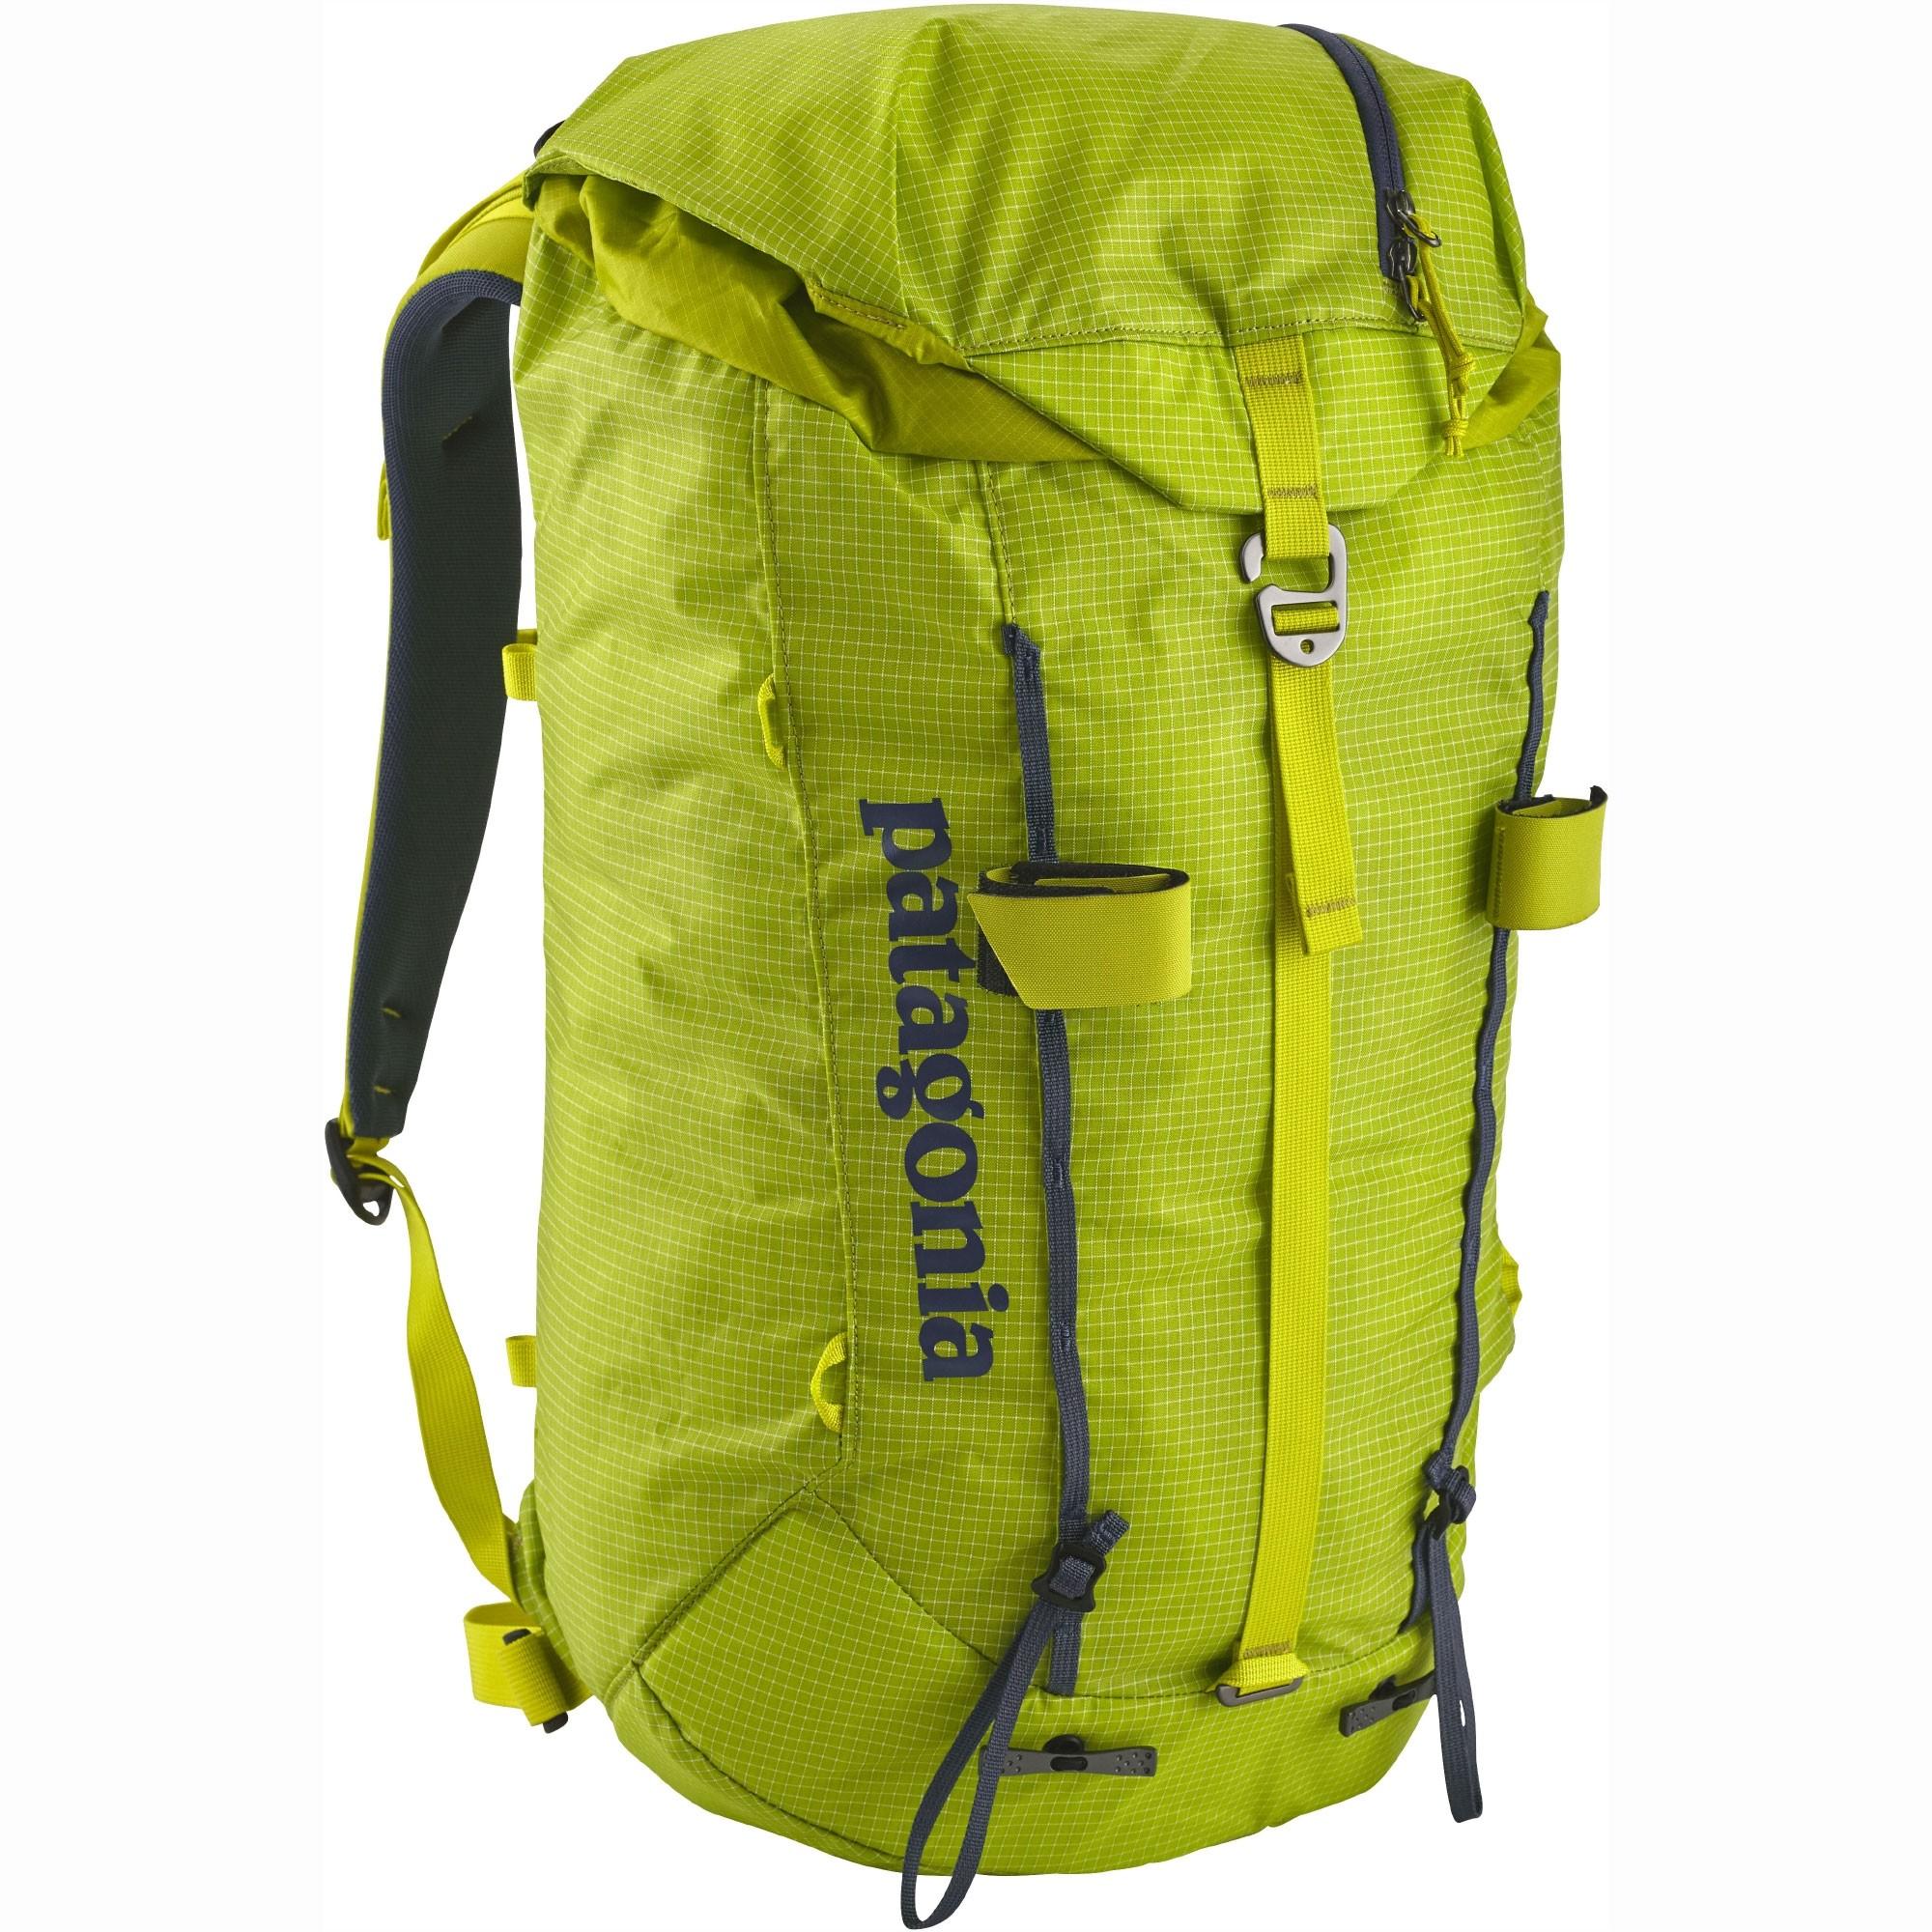 Patagonia-Ascensionist-30L-Rucksack-Gecko-Green-S18